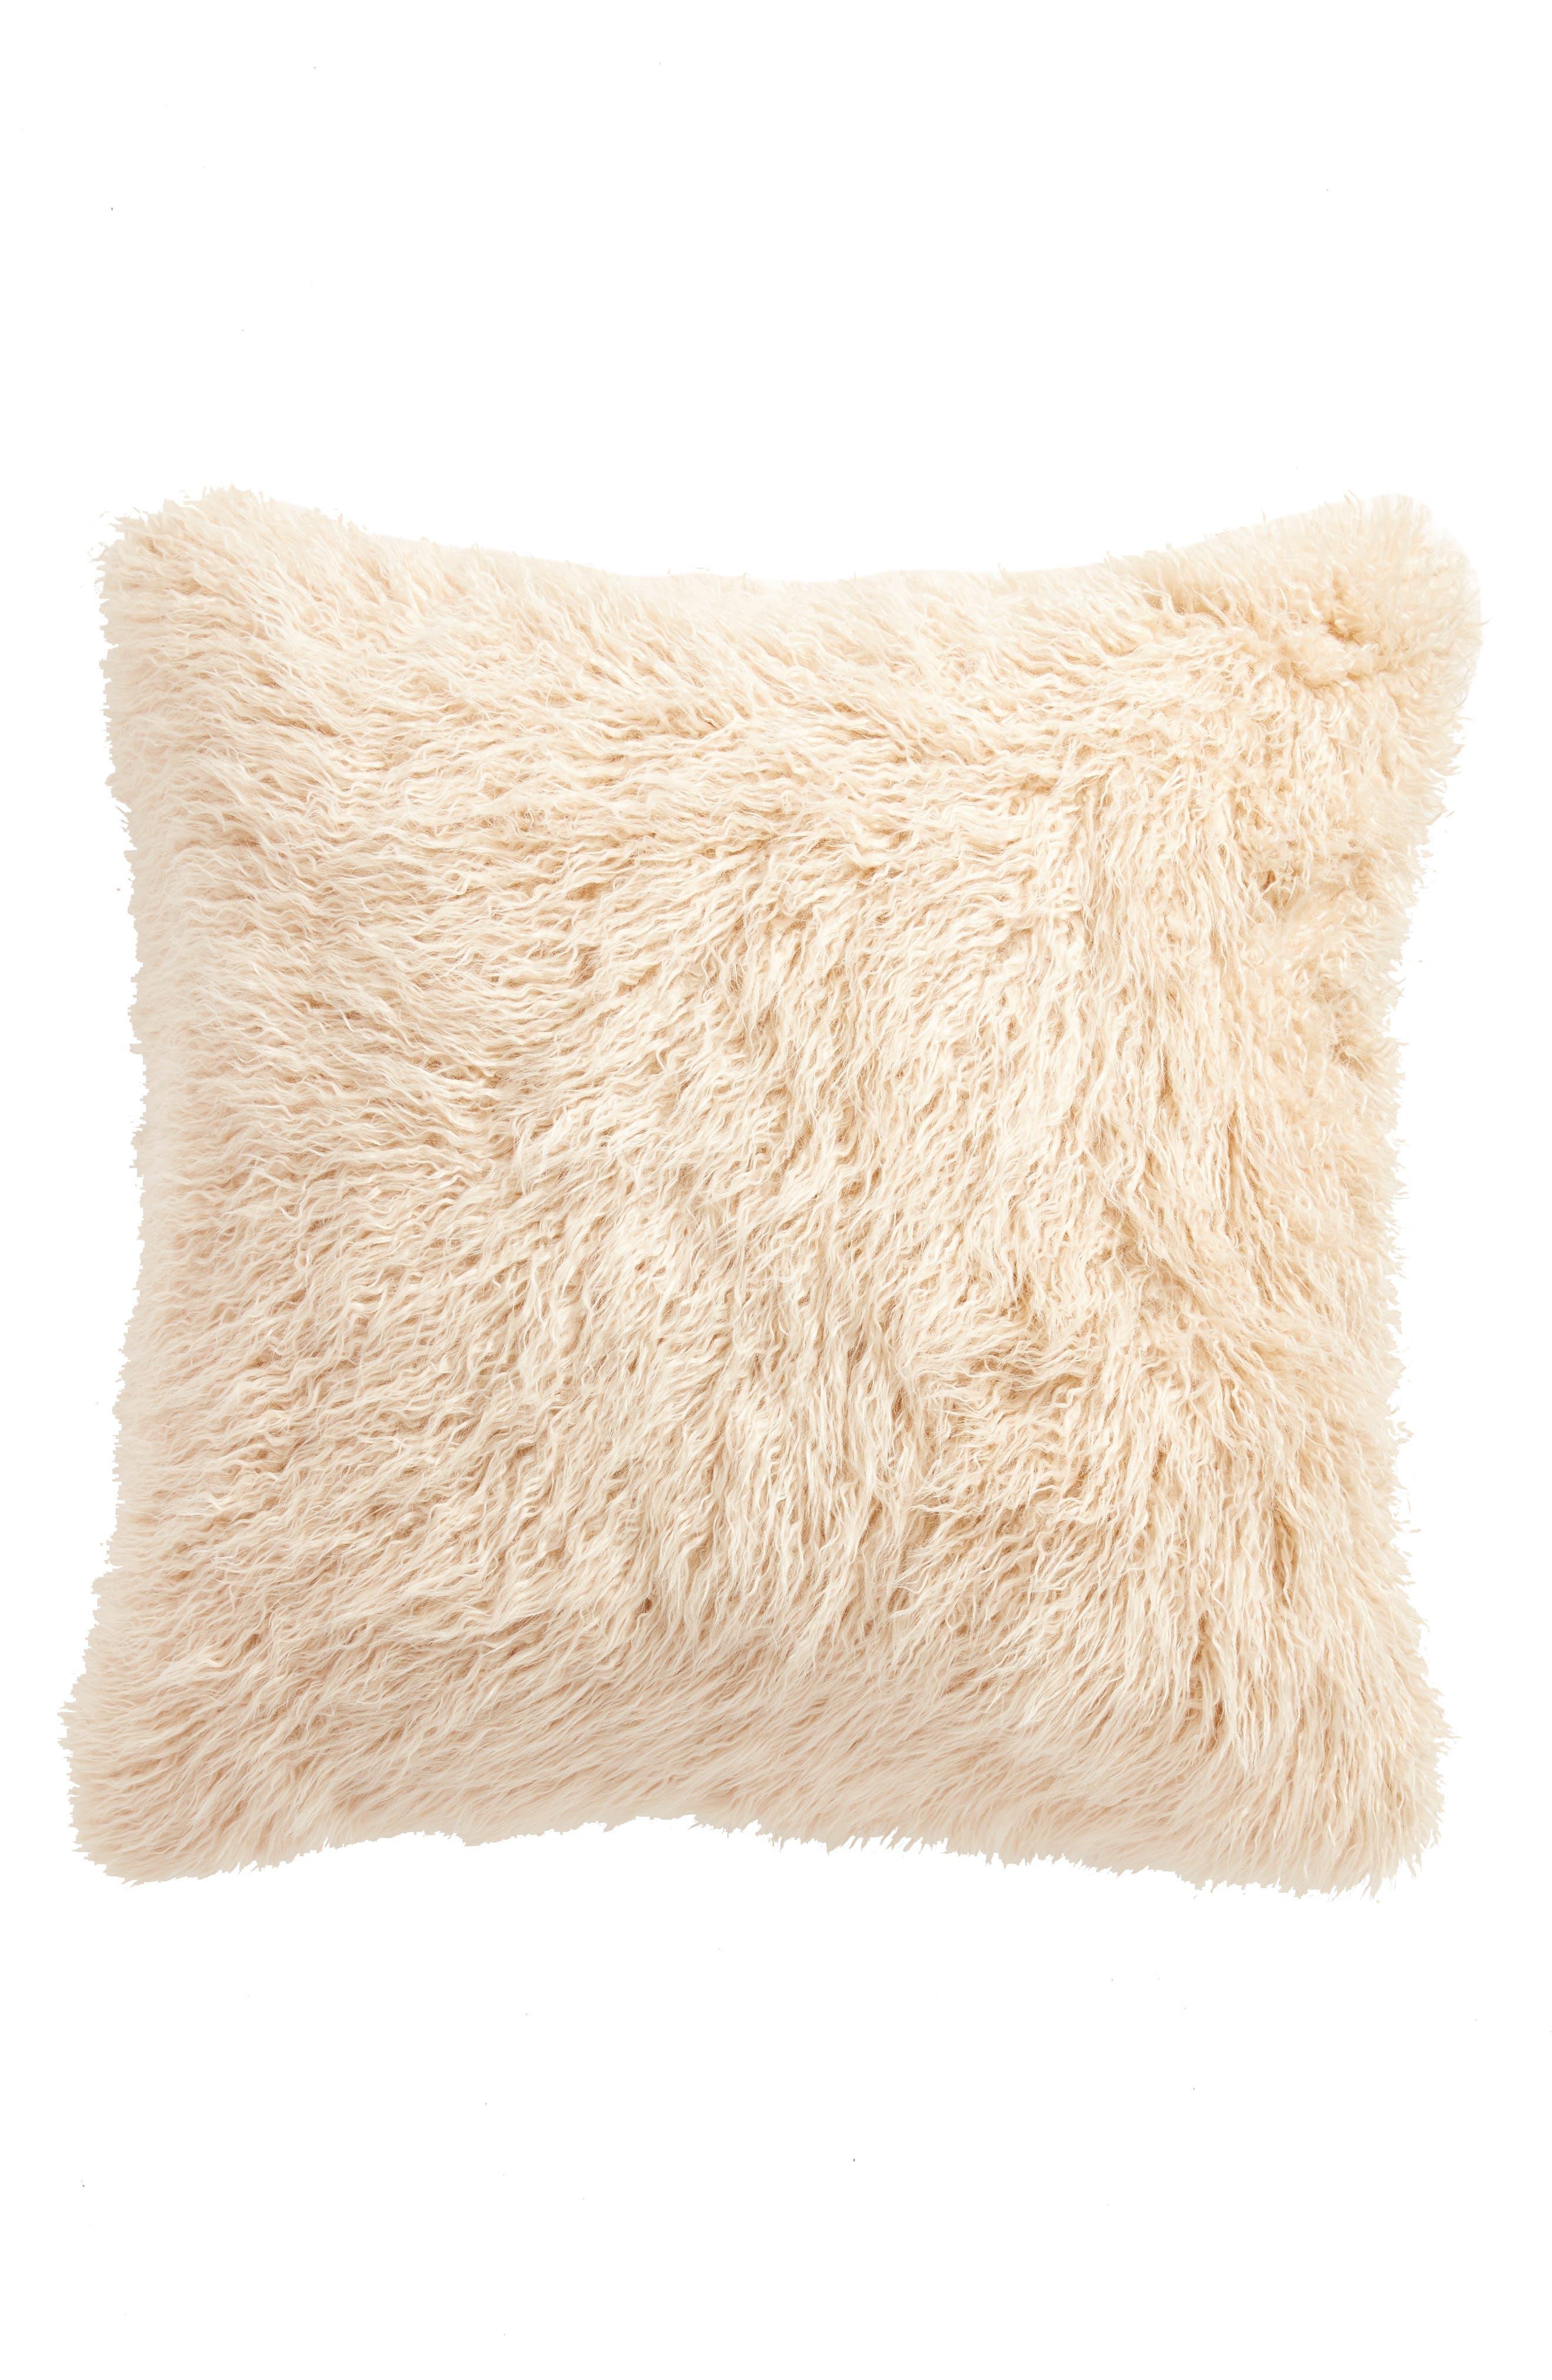 TREASURE & BOND,                             Curly Faux Fur Pillow,                             Alternate thumbnail 2, color,                             BEIGE BEACH